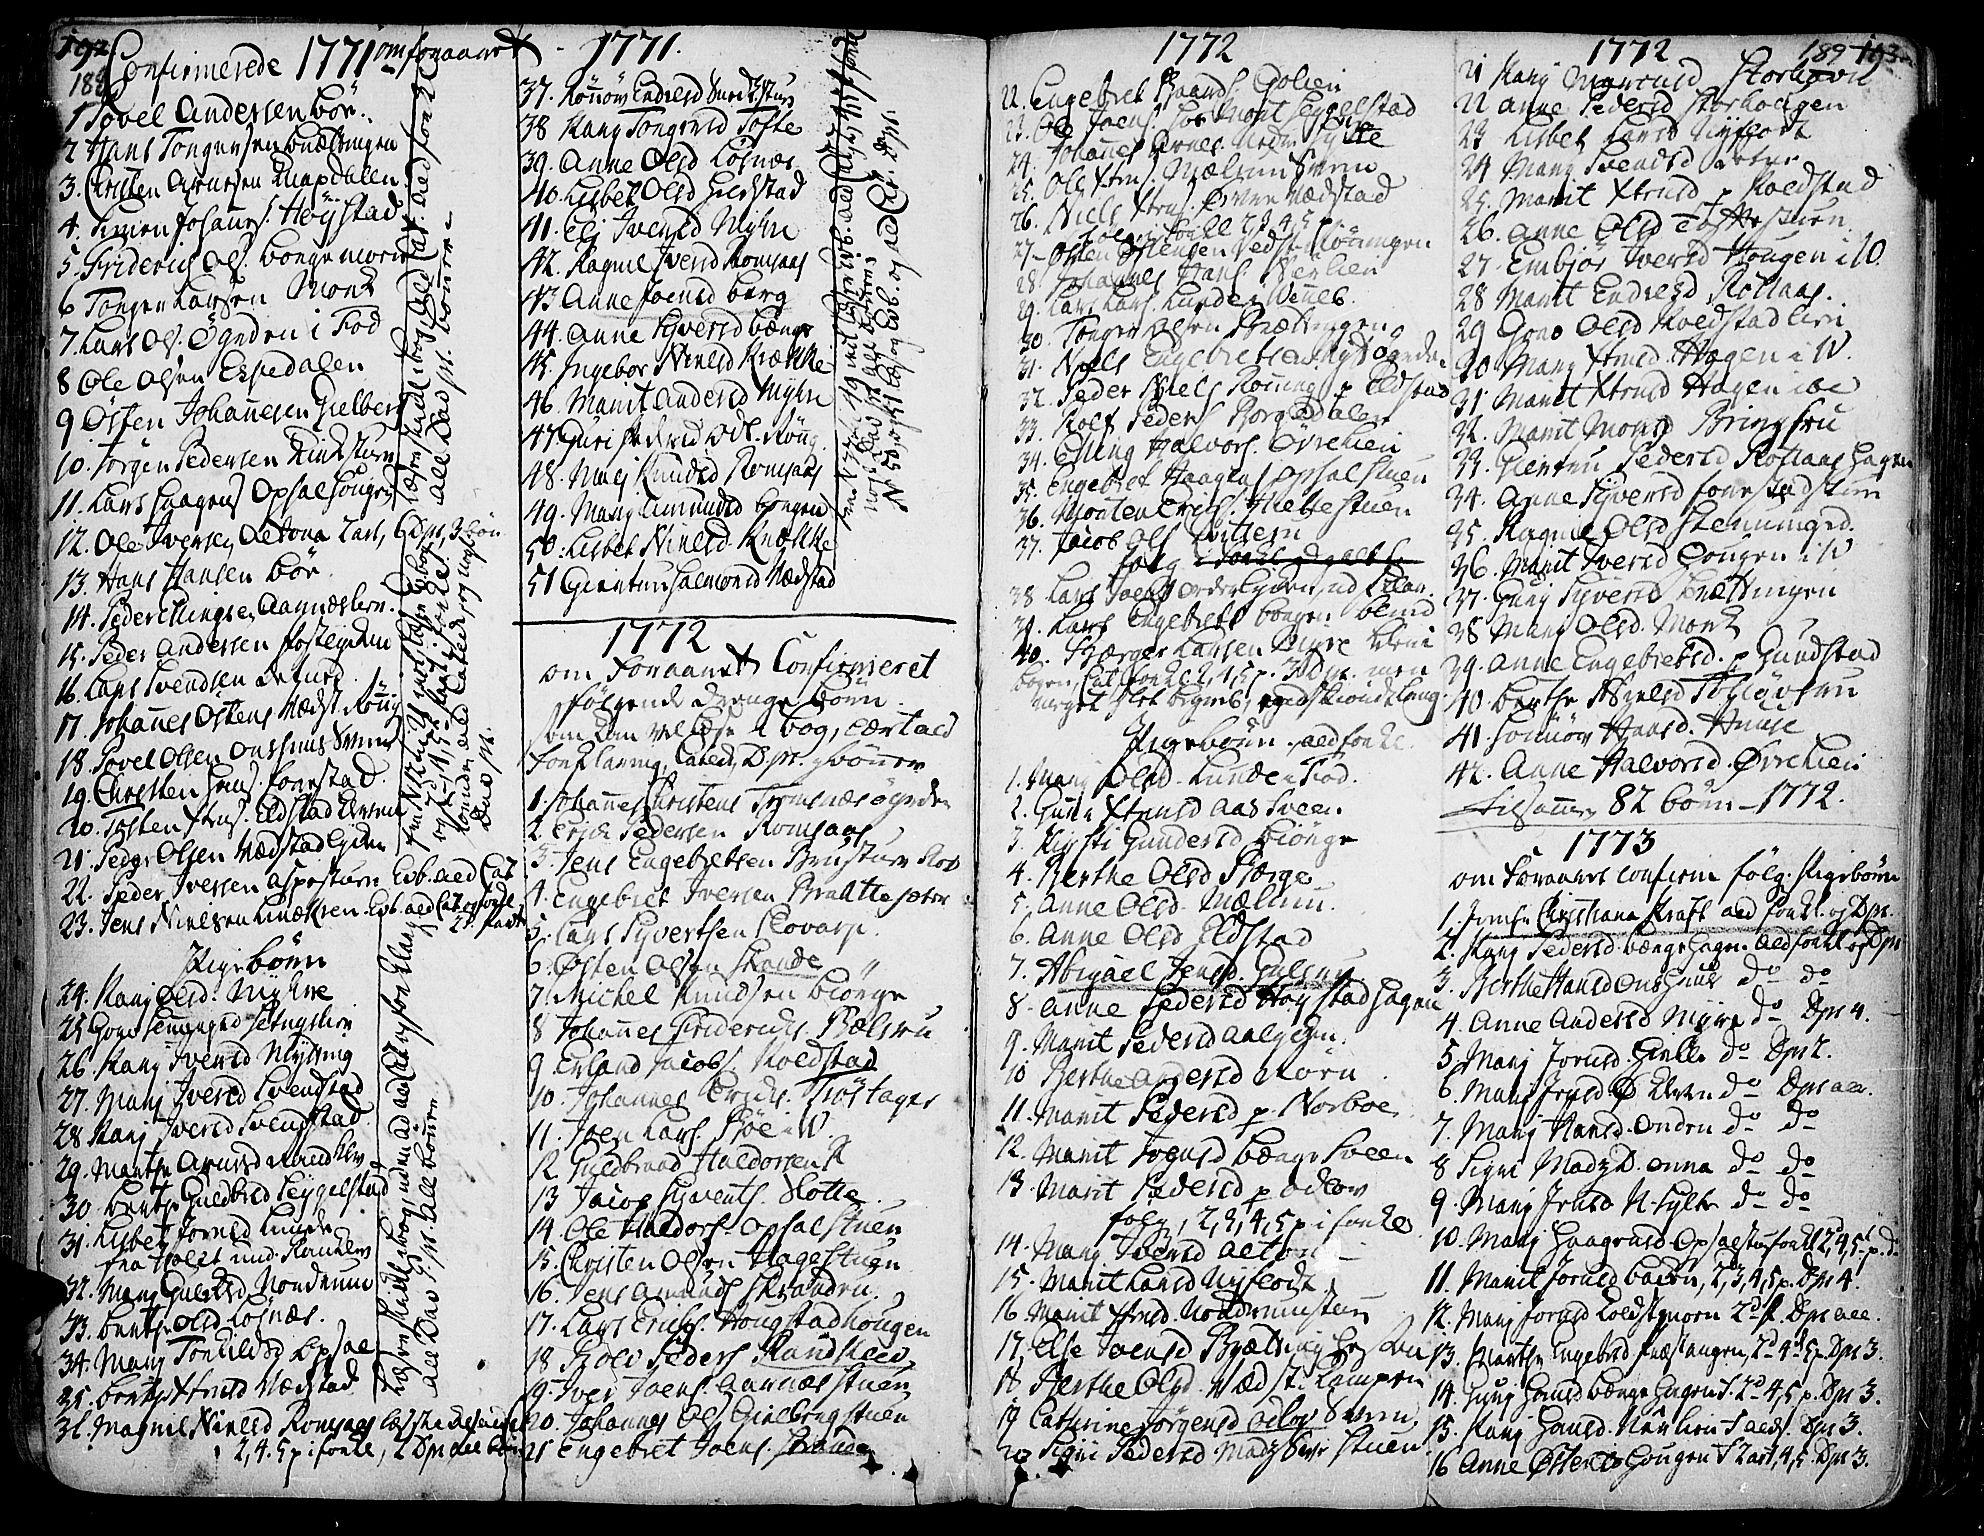 SAH, Ringebu prestekontor, Ministerialbok nr. 2, 1734-1780, s. 188-189